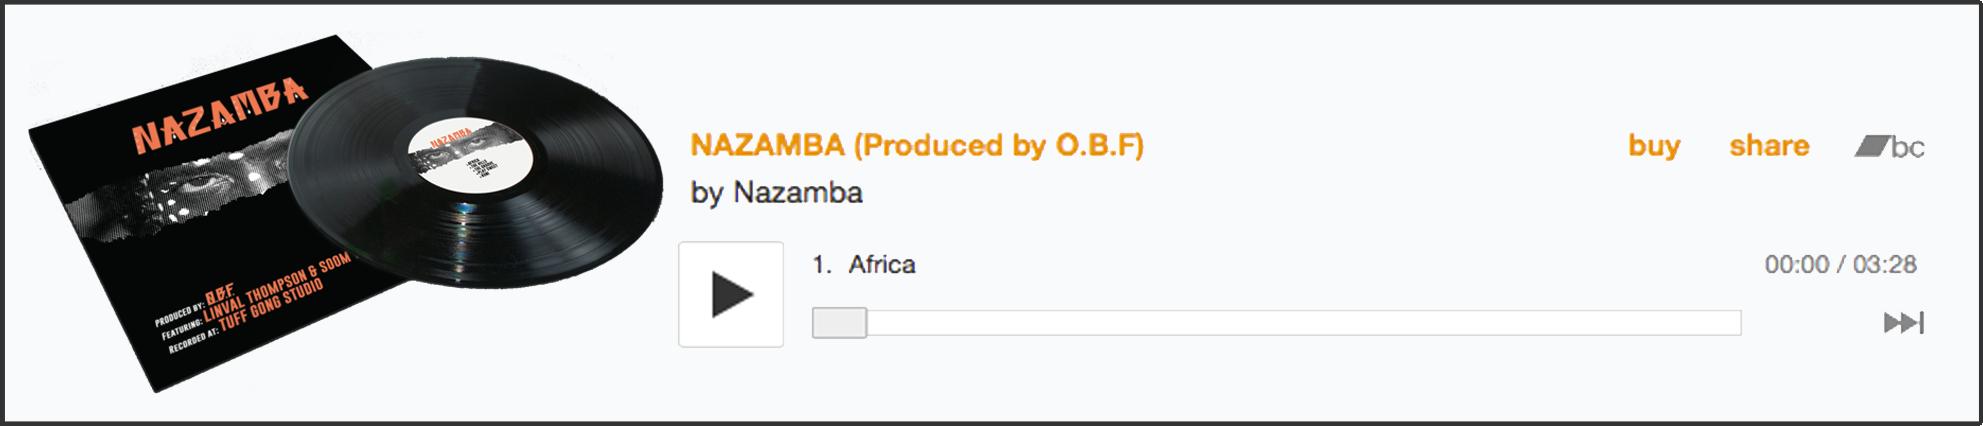 Ecouter l'album, Nazamba produit par OBF